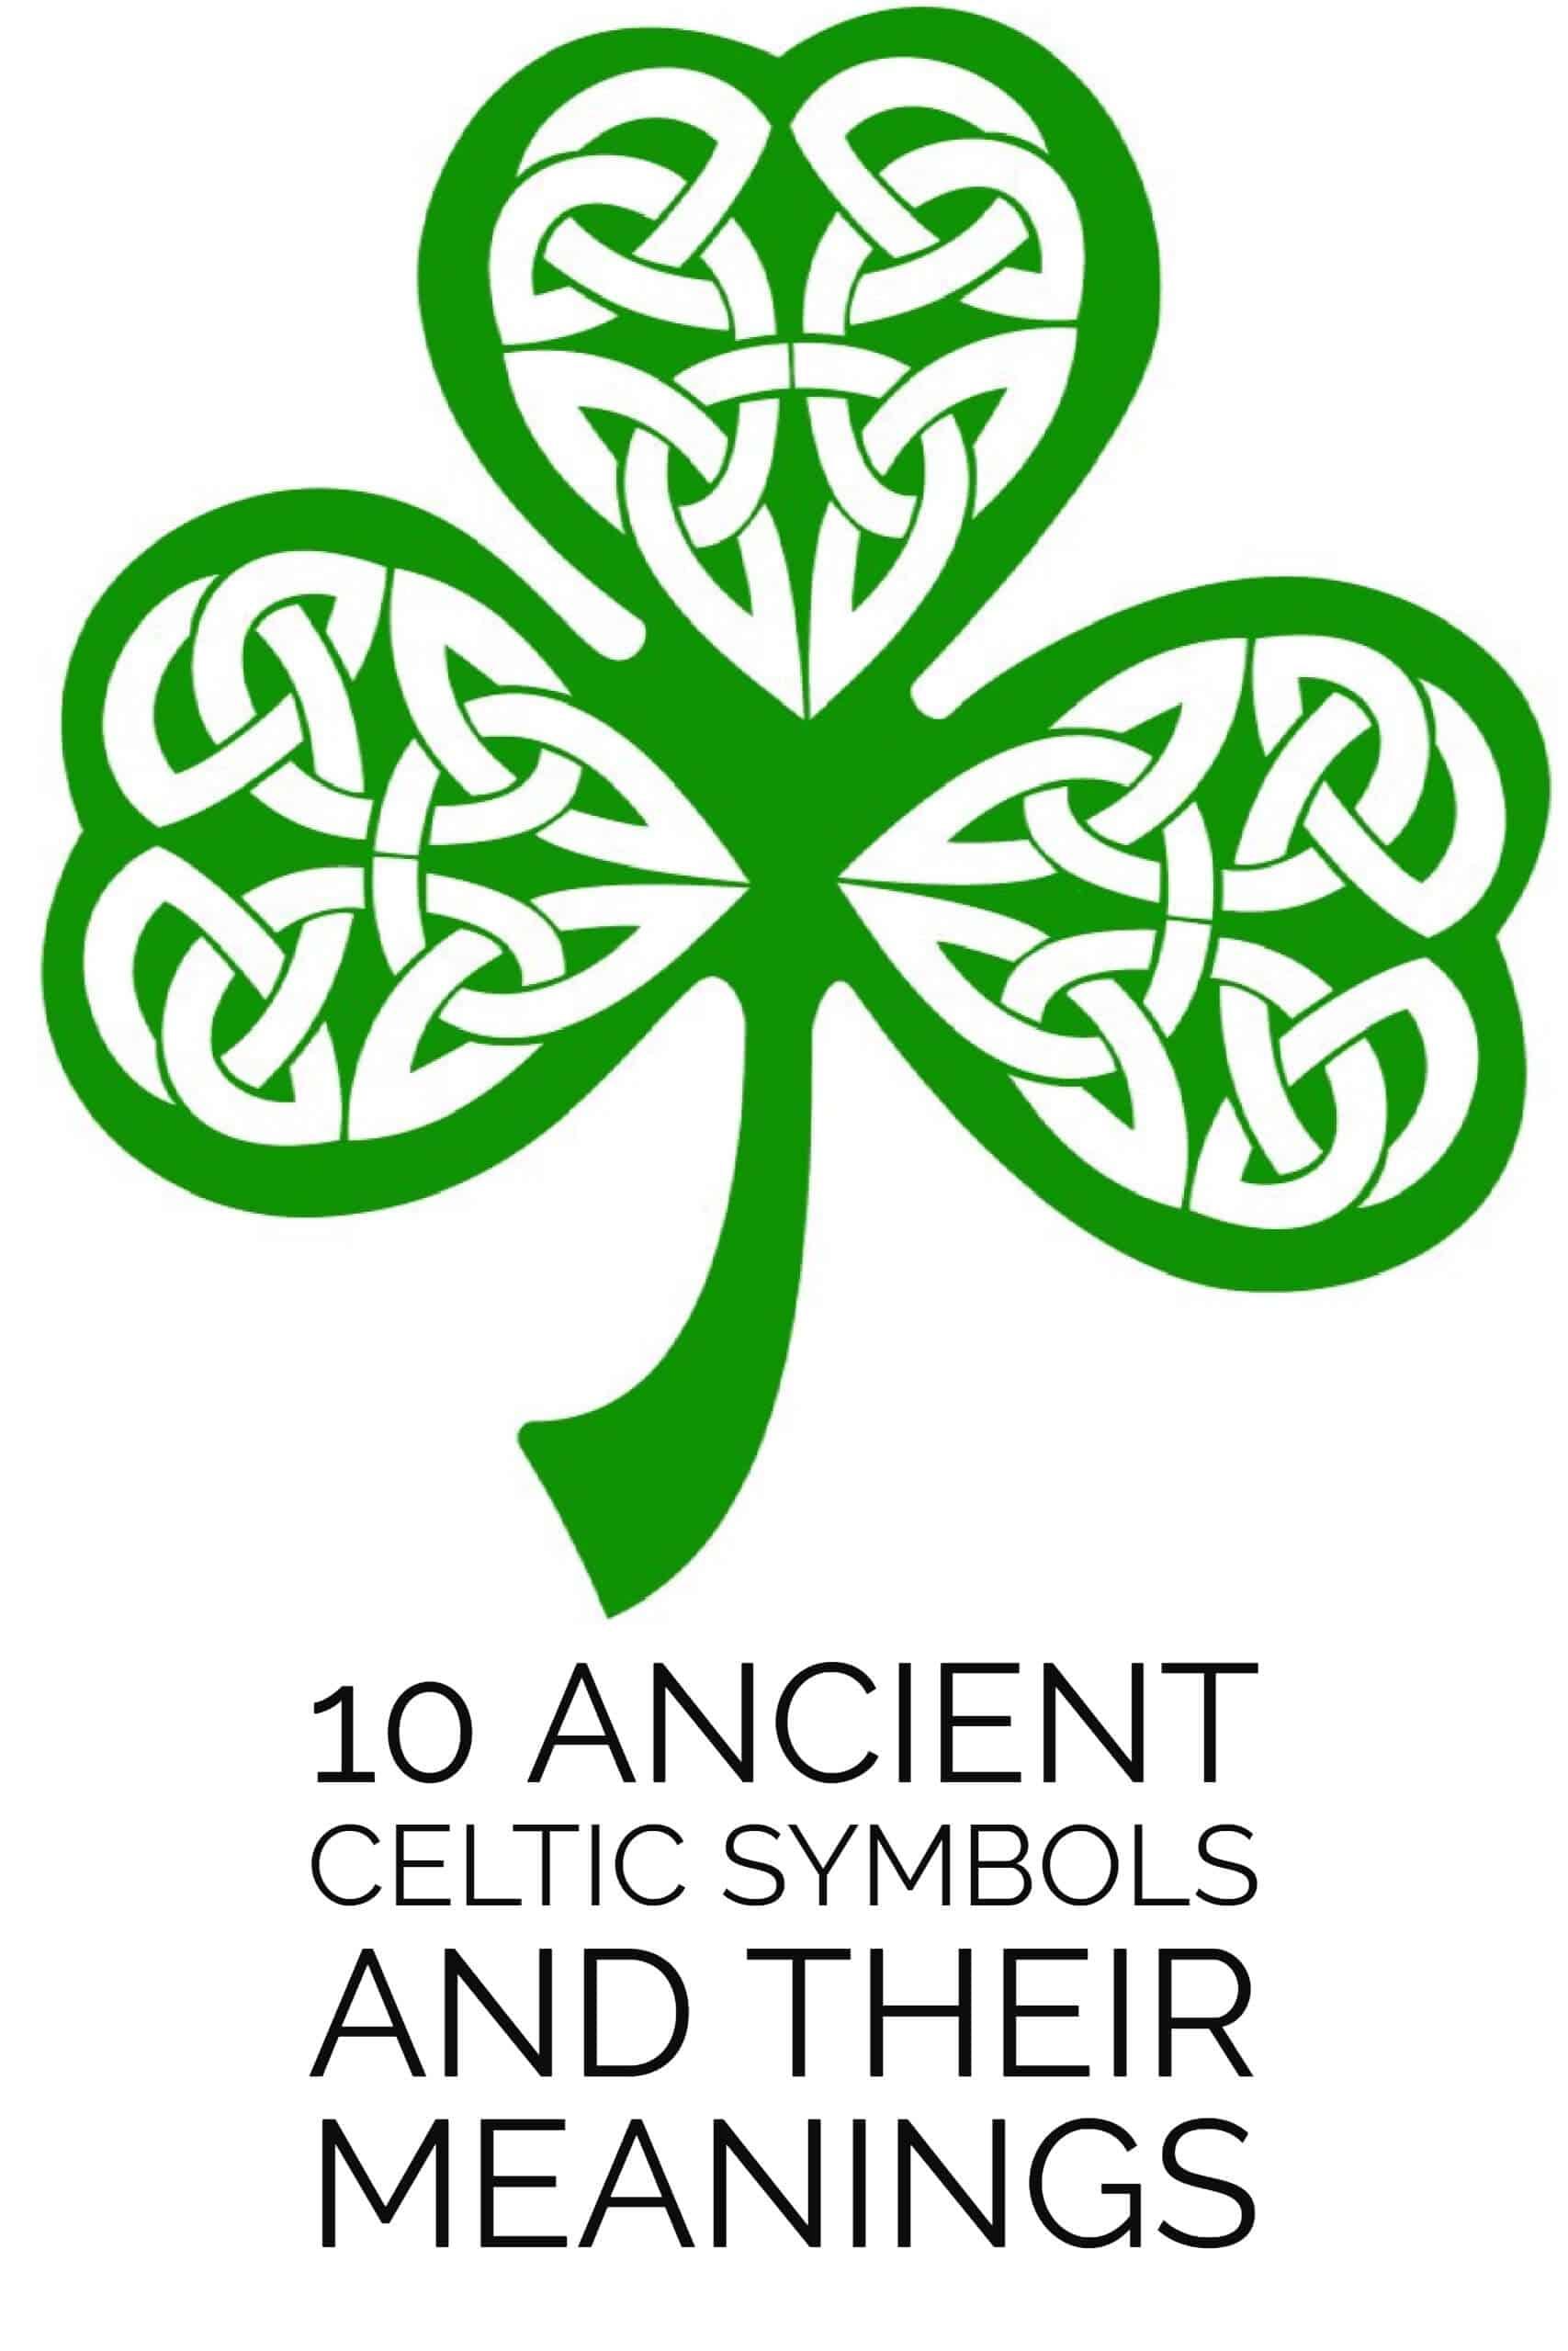 ancient celtic symbols and